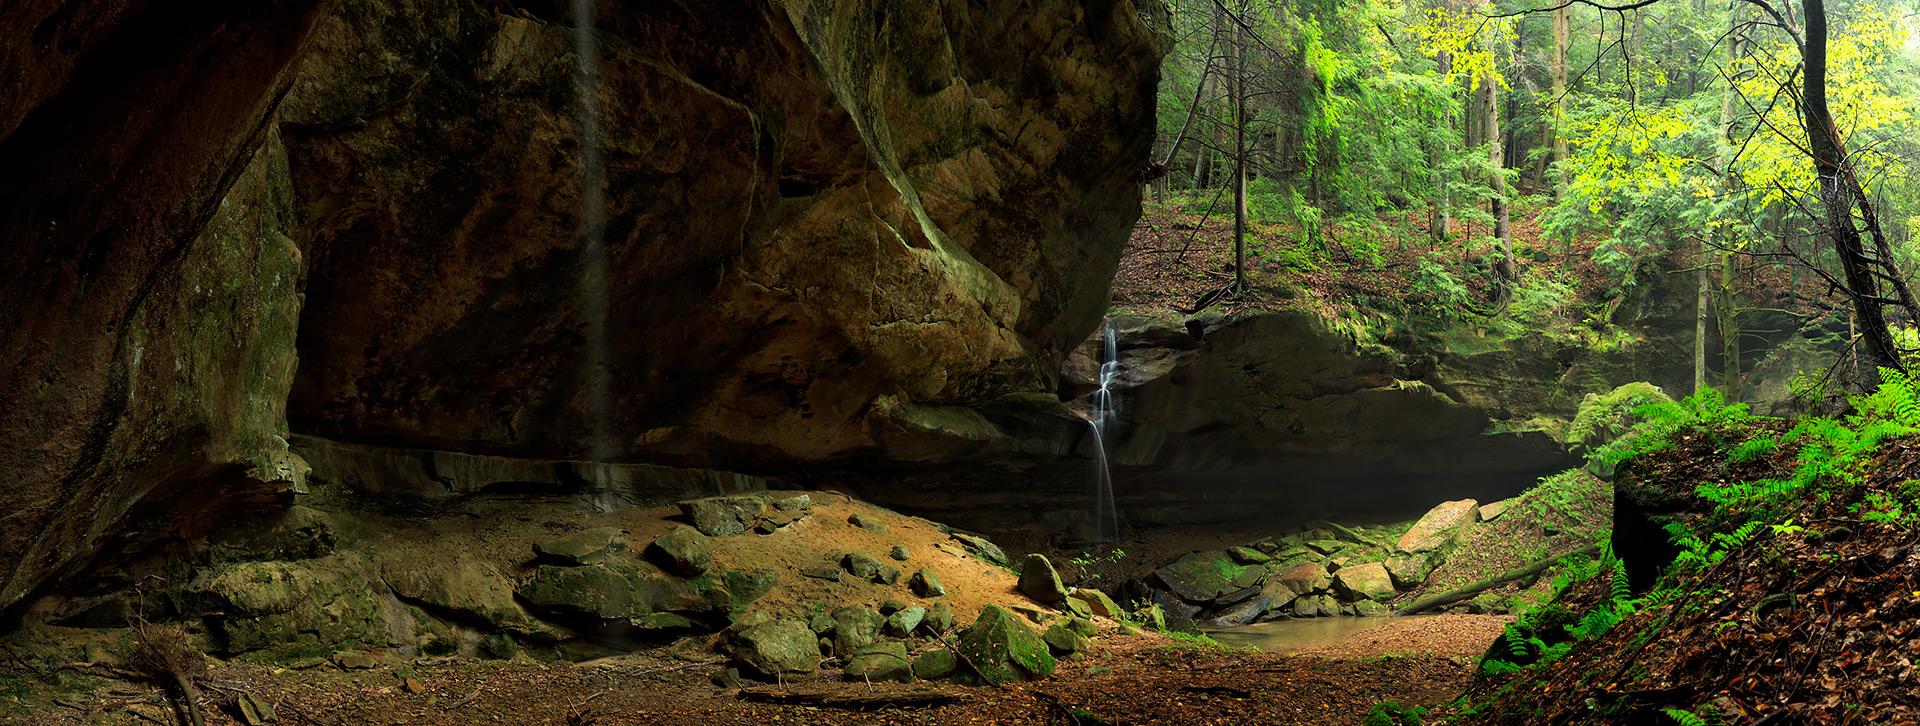 Double Waterfall Panorama